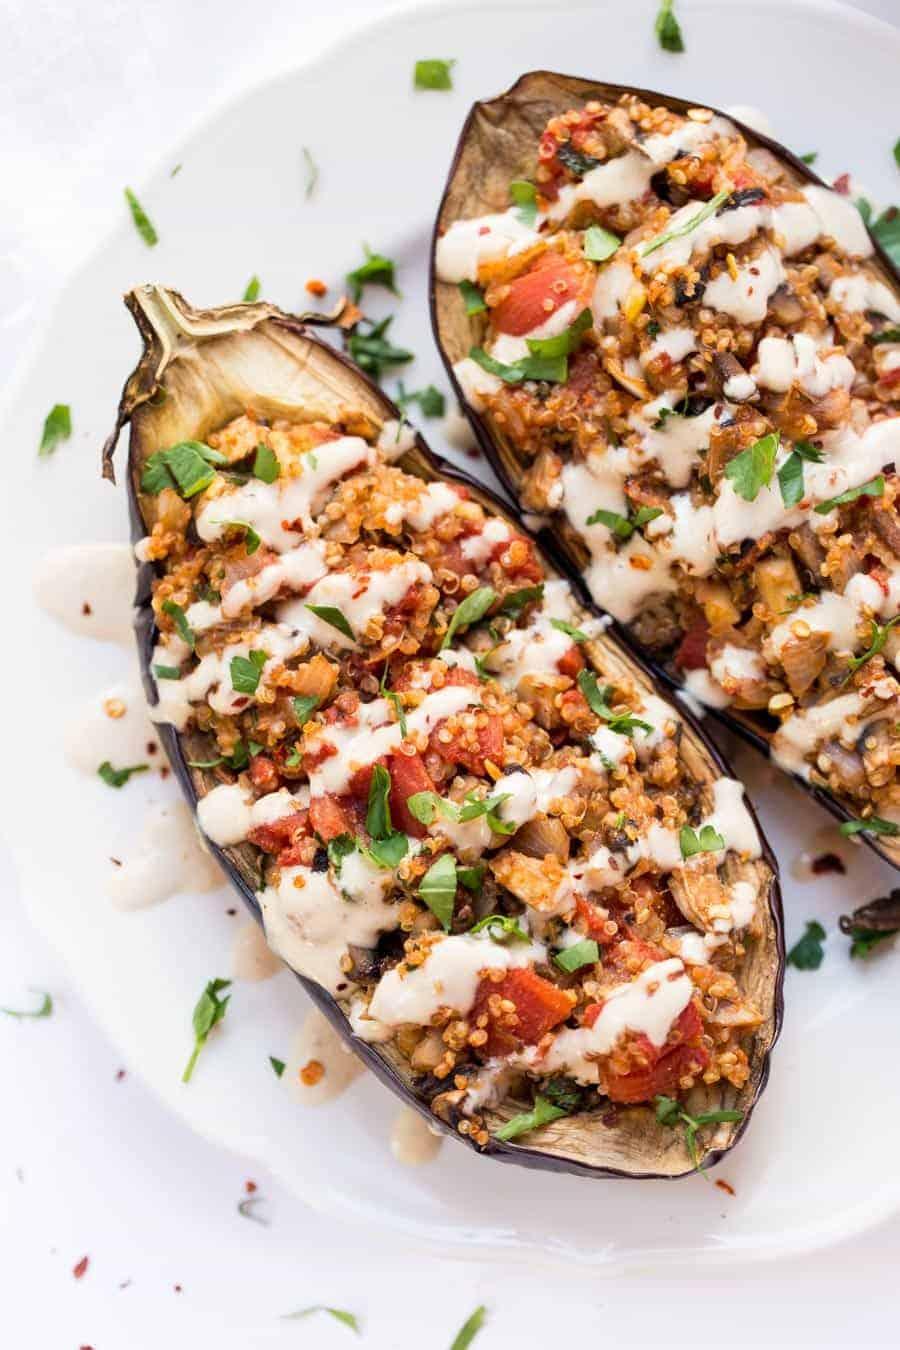 Quinoa Stuffed Eggplant With Mushrooms Tomatoes And A Creamy Tahini Sauce On Top